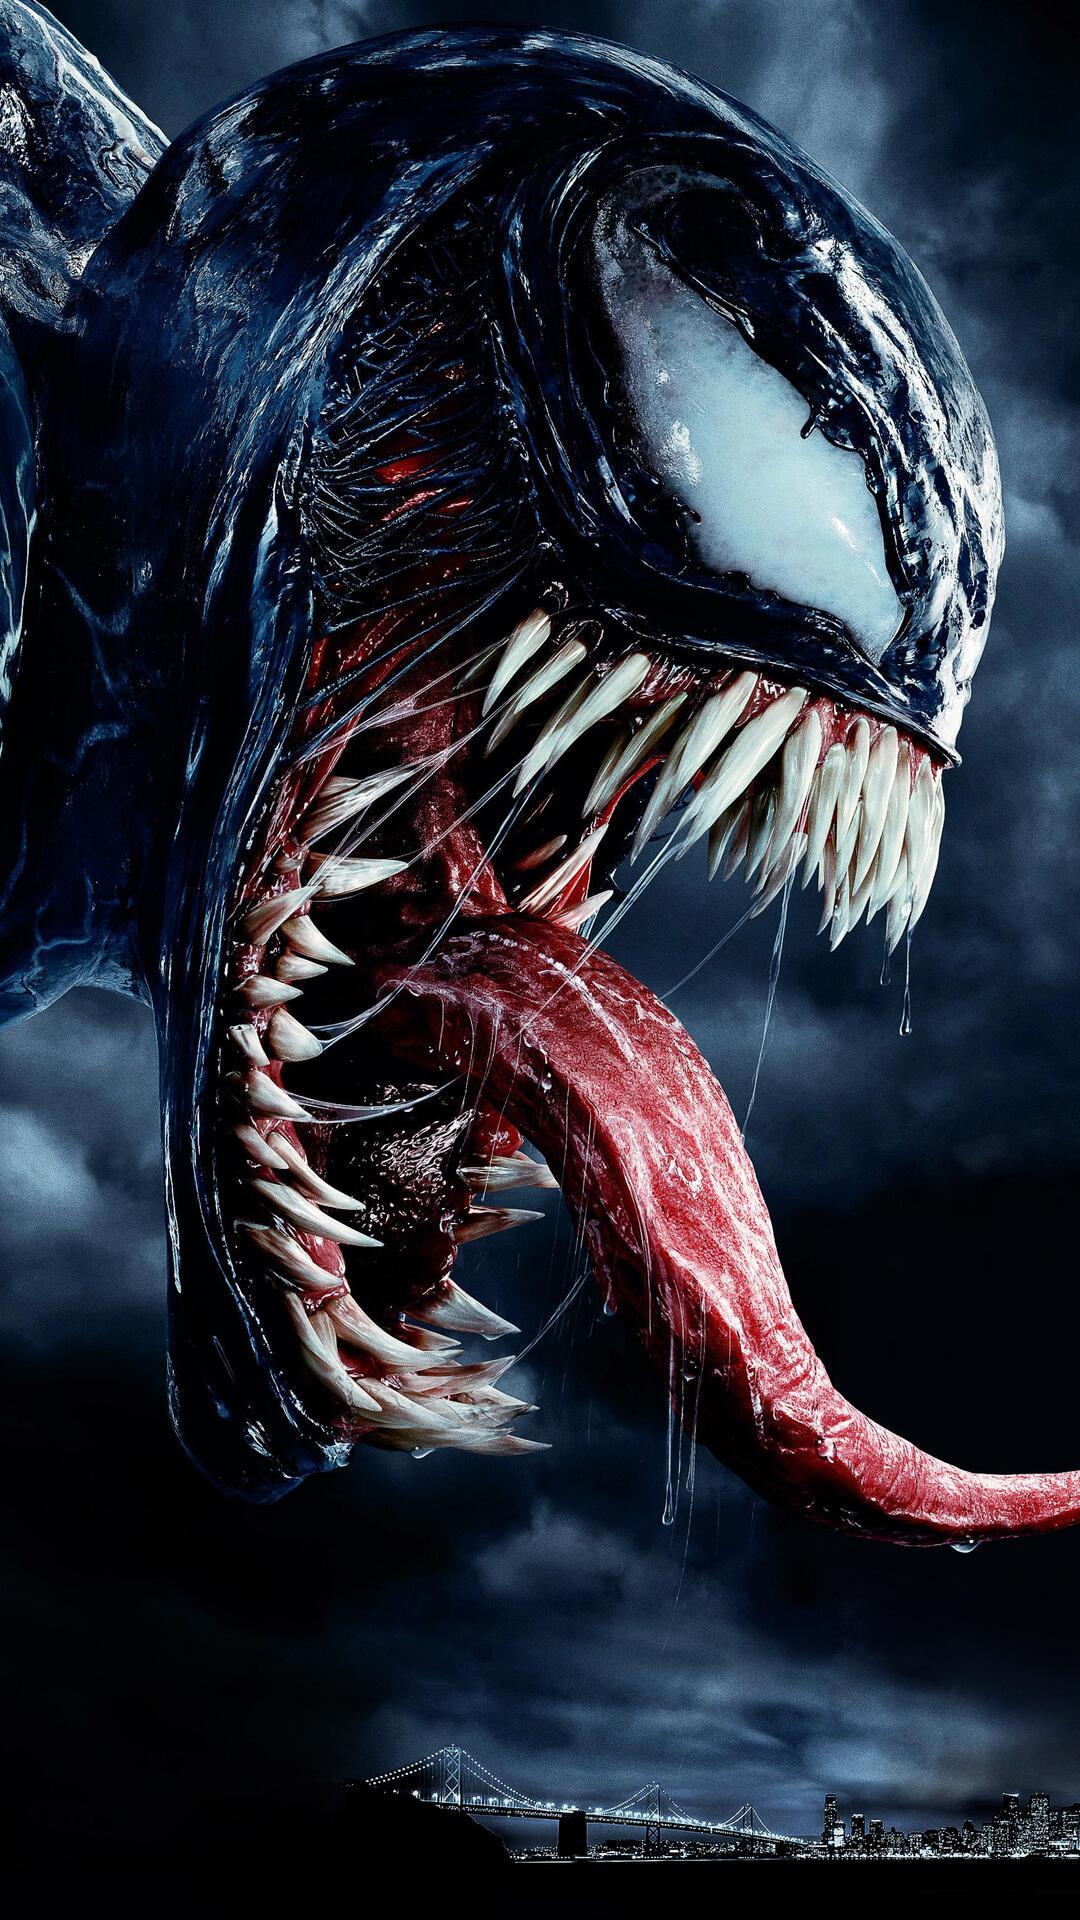 1080x1920 Venom Movie Japanese Poster Iphone 7 6s 6 Plus Pixel Xl